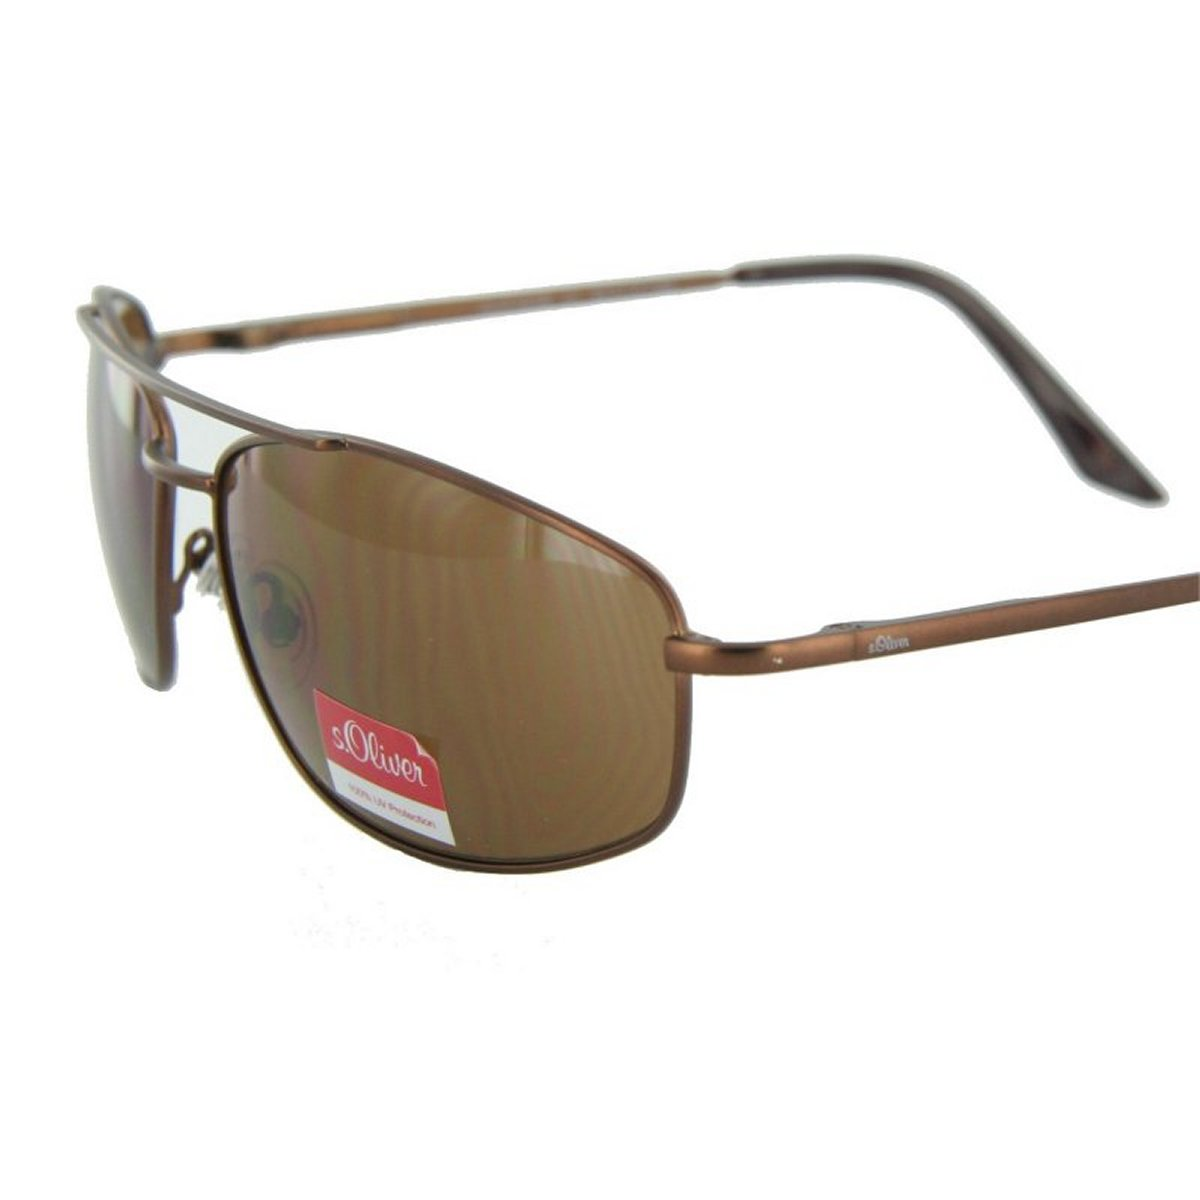 S.oliver Sonnenbrille 4214 C3 Light Gun Mat Etui Neu Damen-accessoires